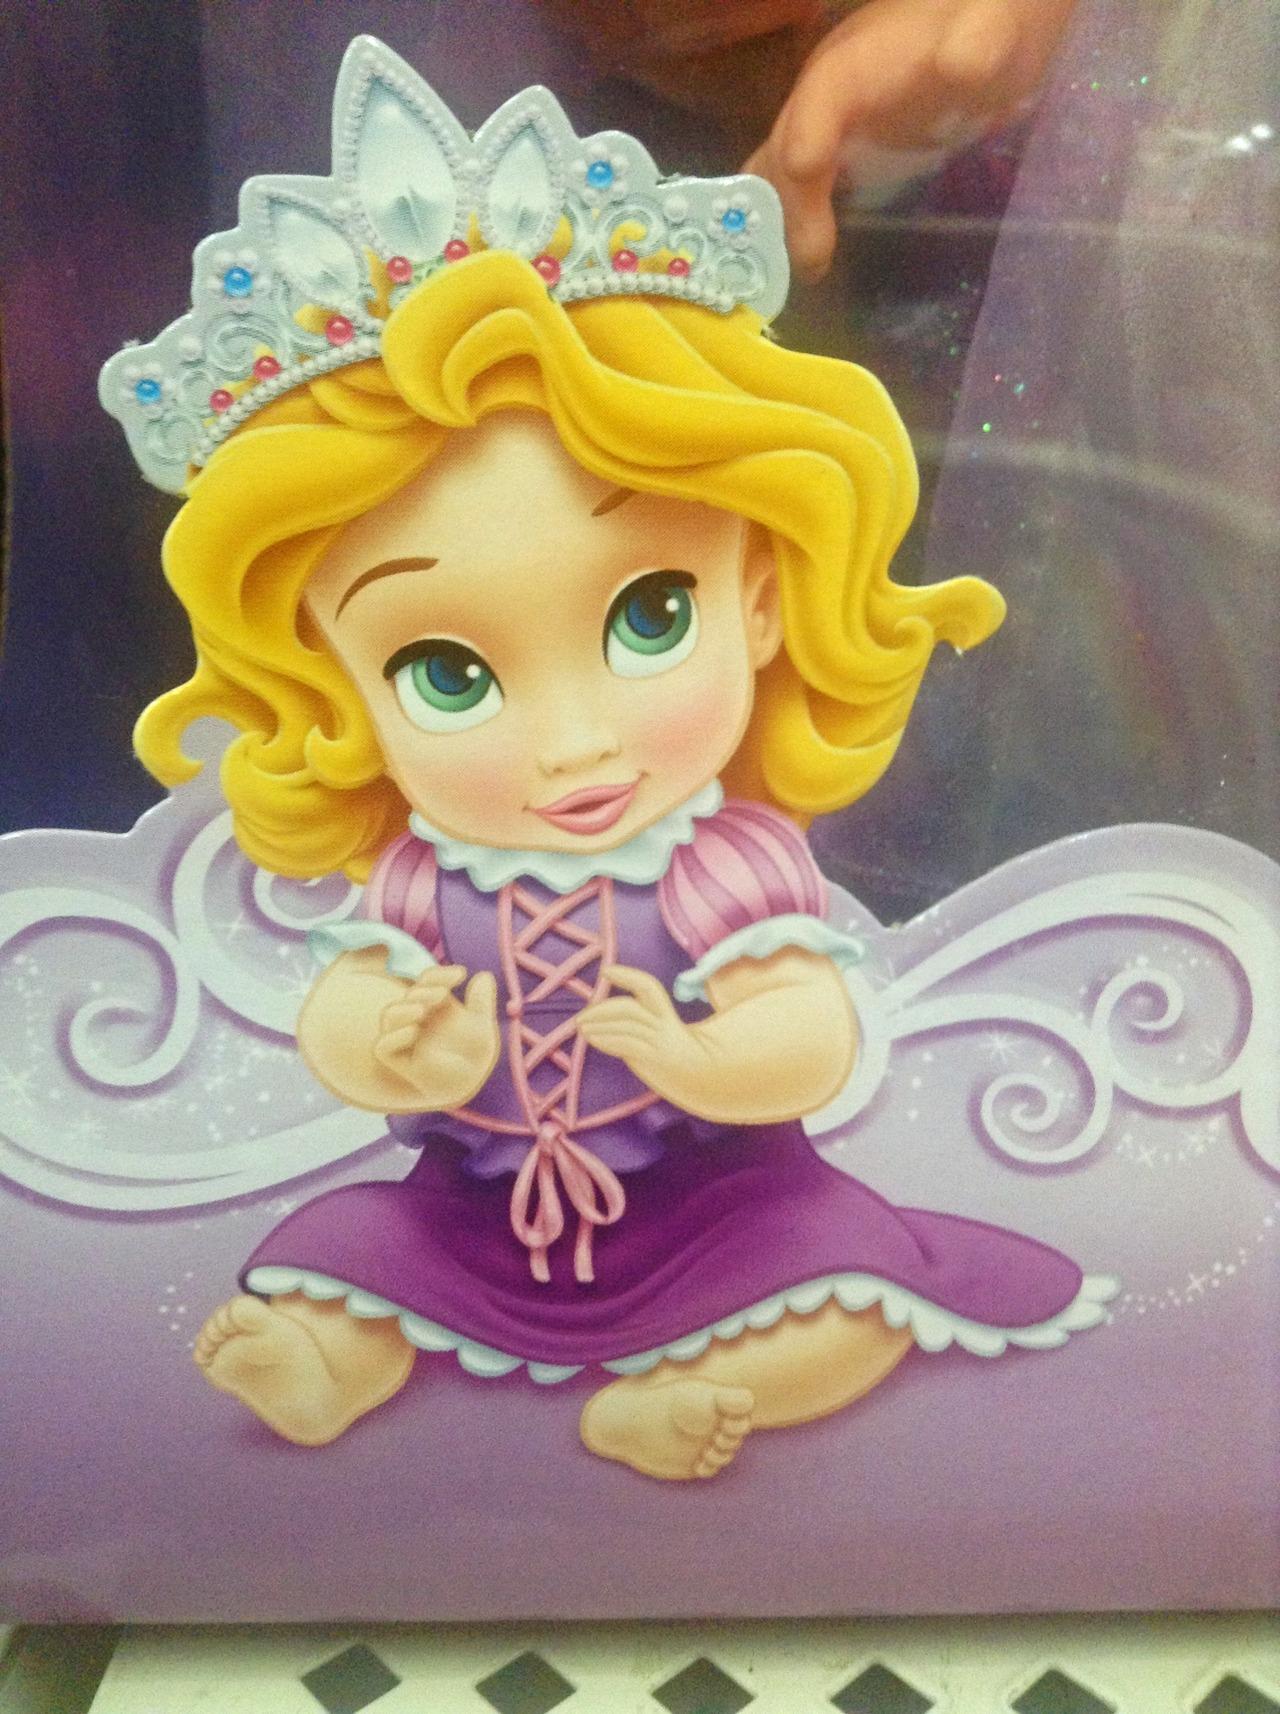 baby disney princess wallpaper - photo #14